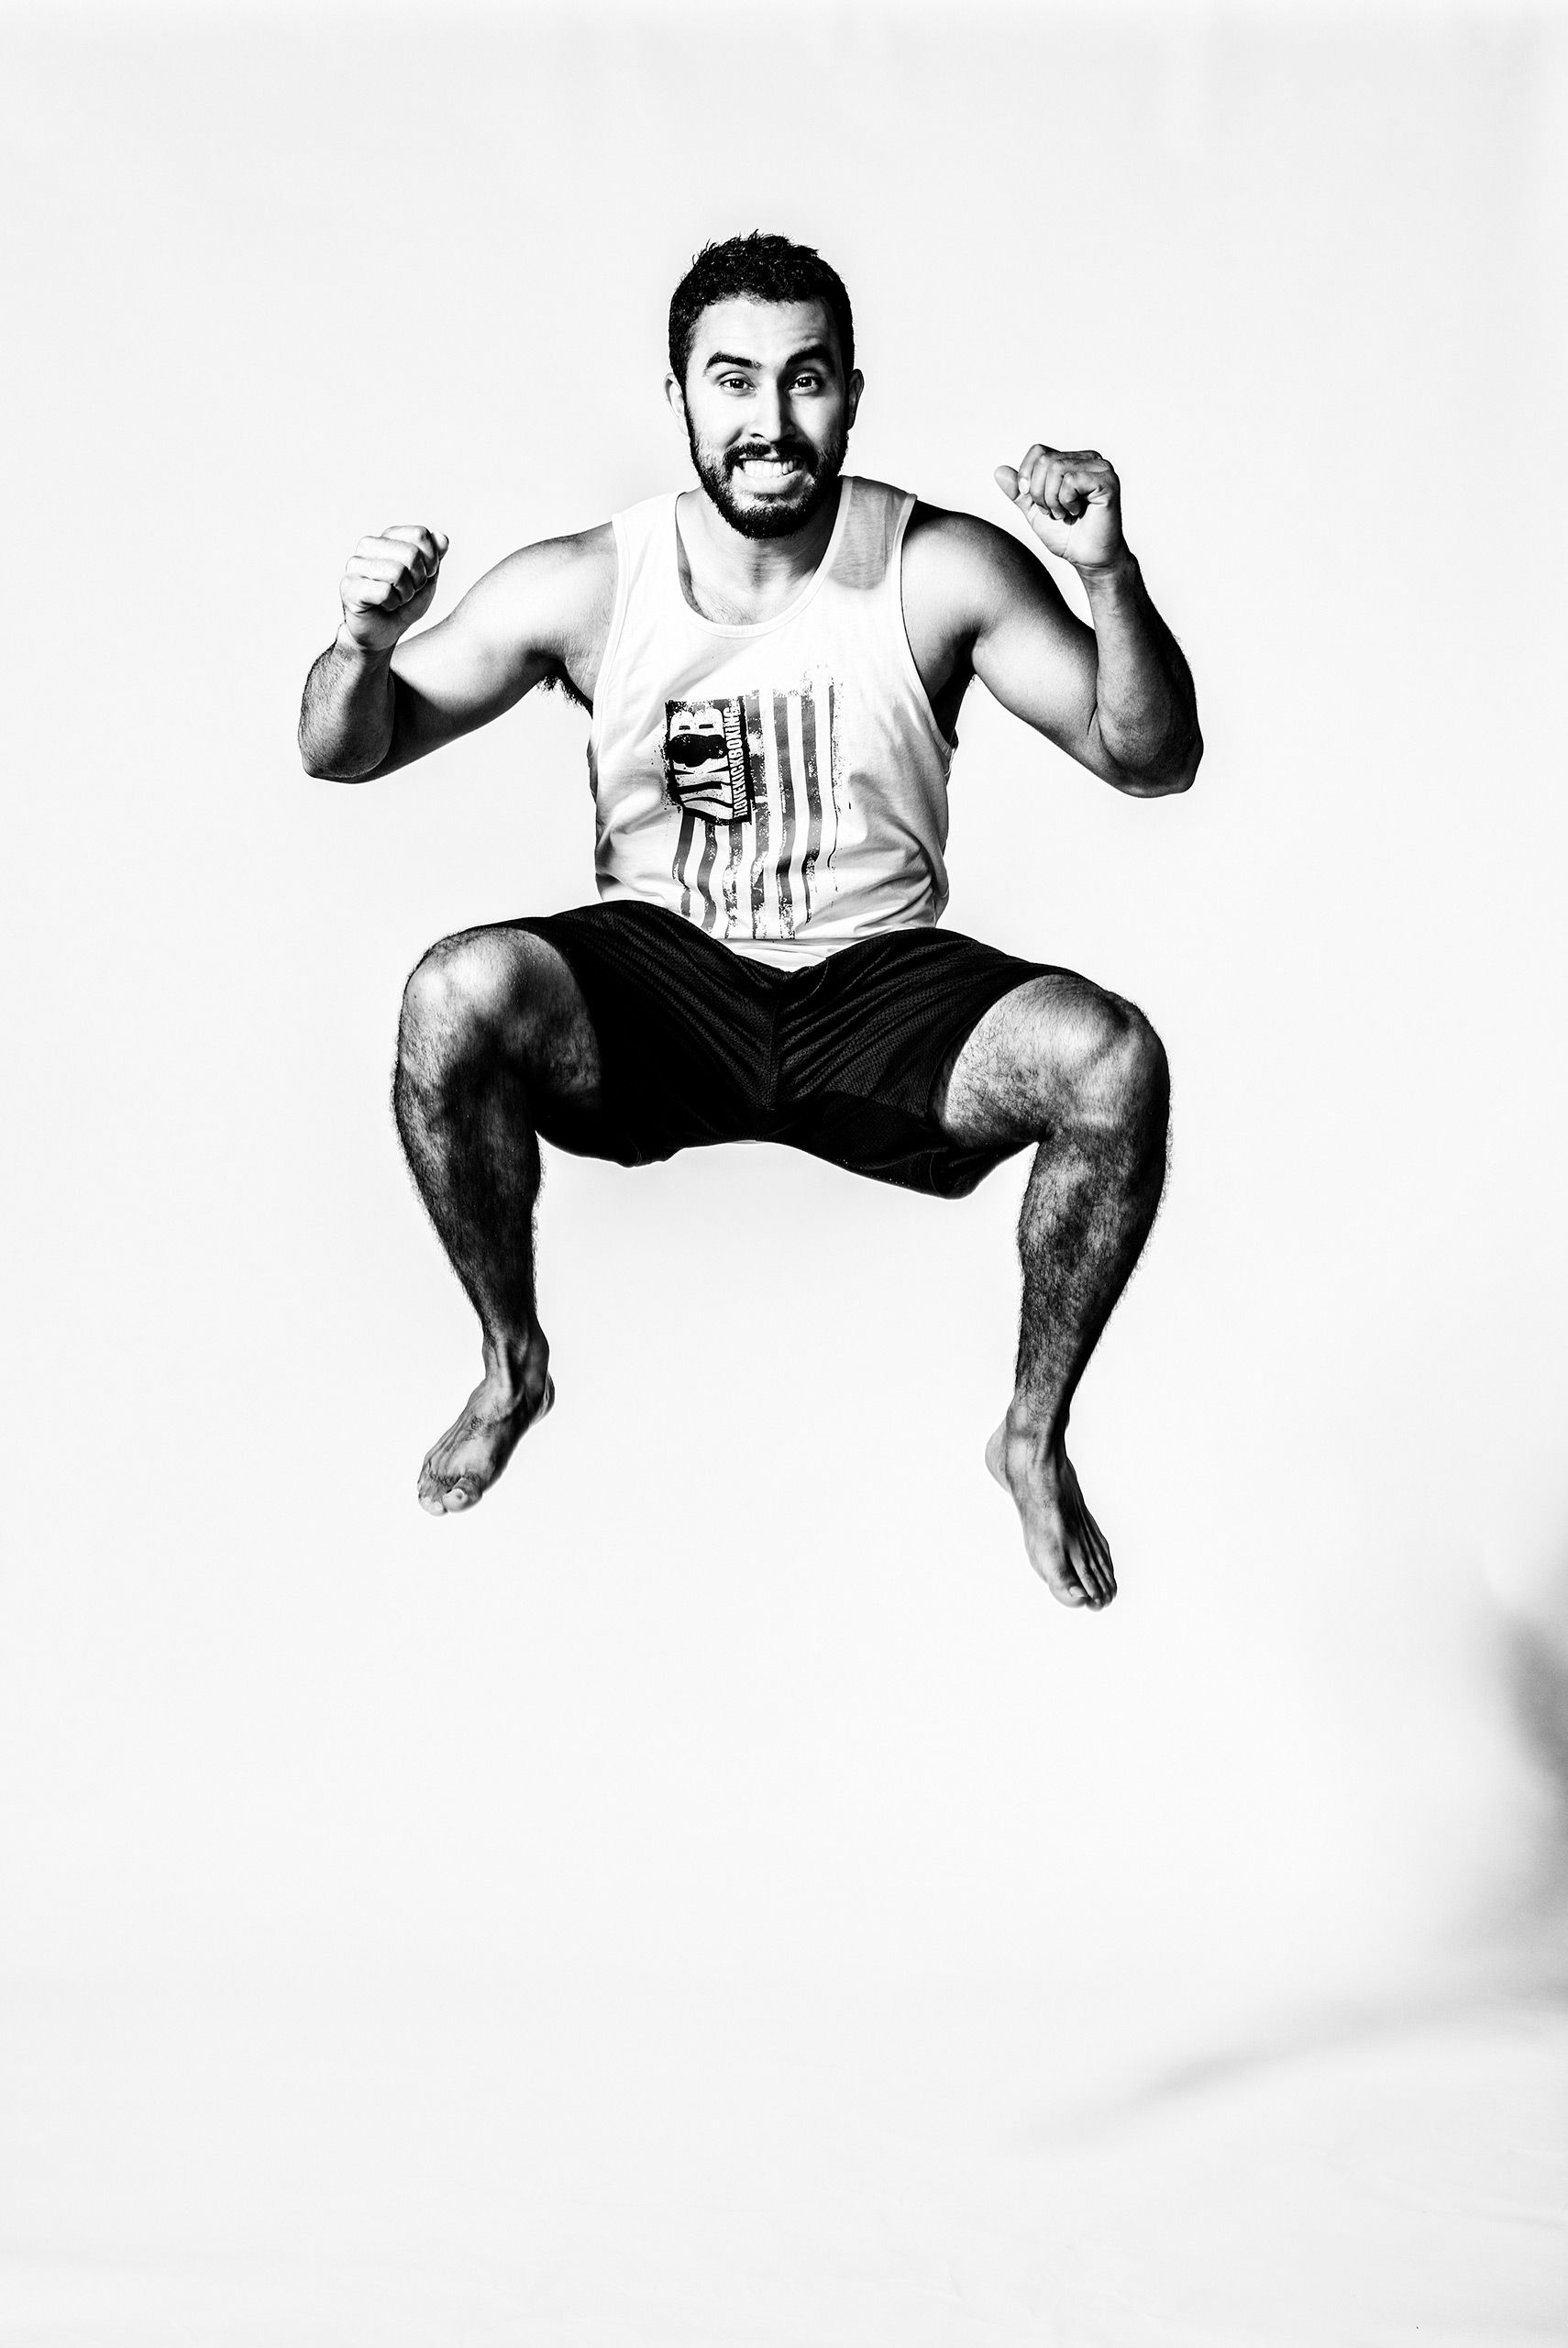 Kickboxer-jumping-HenrikOlundPhotography.jpg